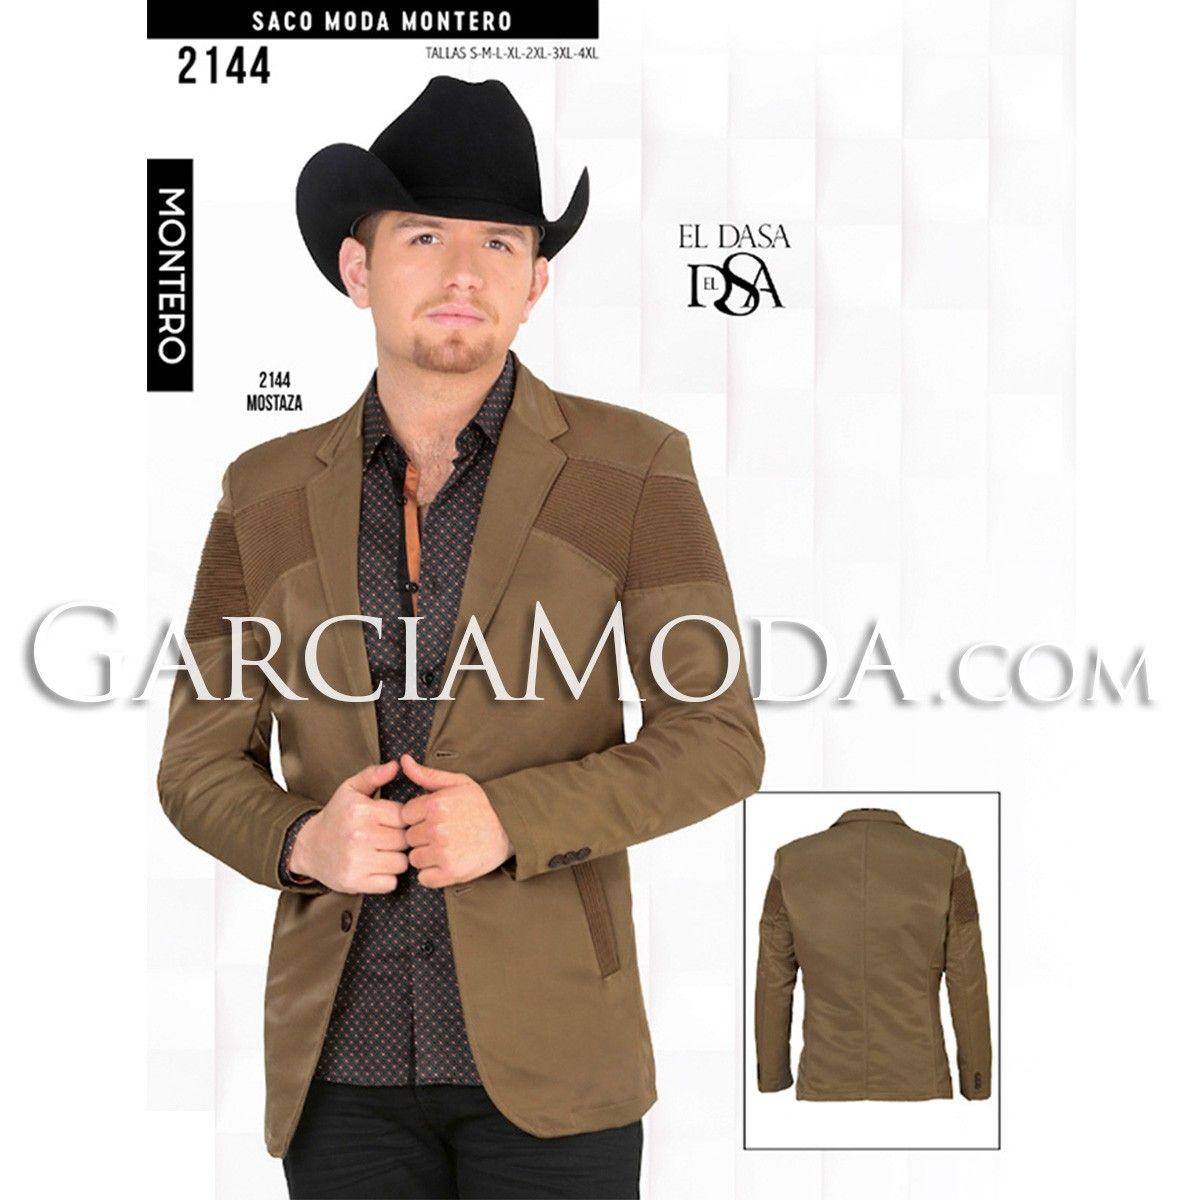 fcdb439ffe Saco Vaquero Montero Western Wear 2144 Mostaza